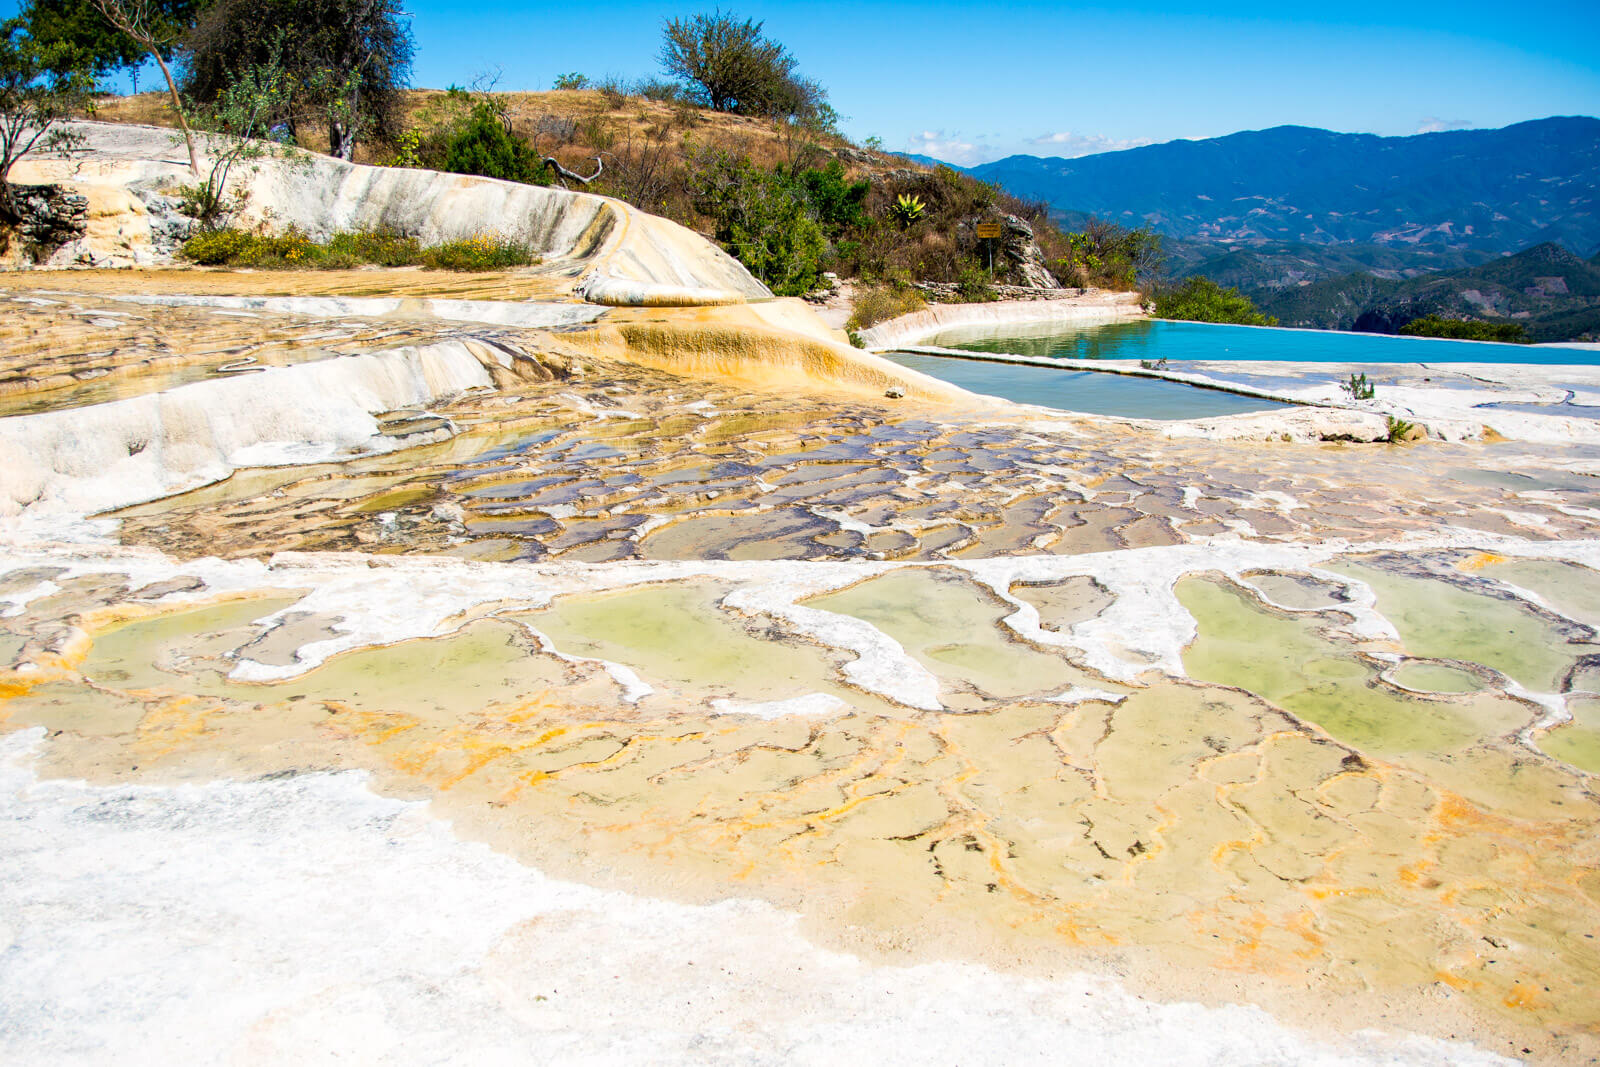 The natural wonders of Hierve el Agua, Oaxaca